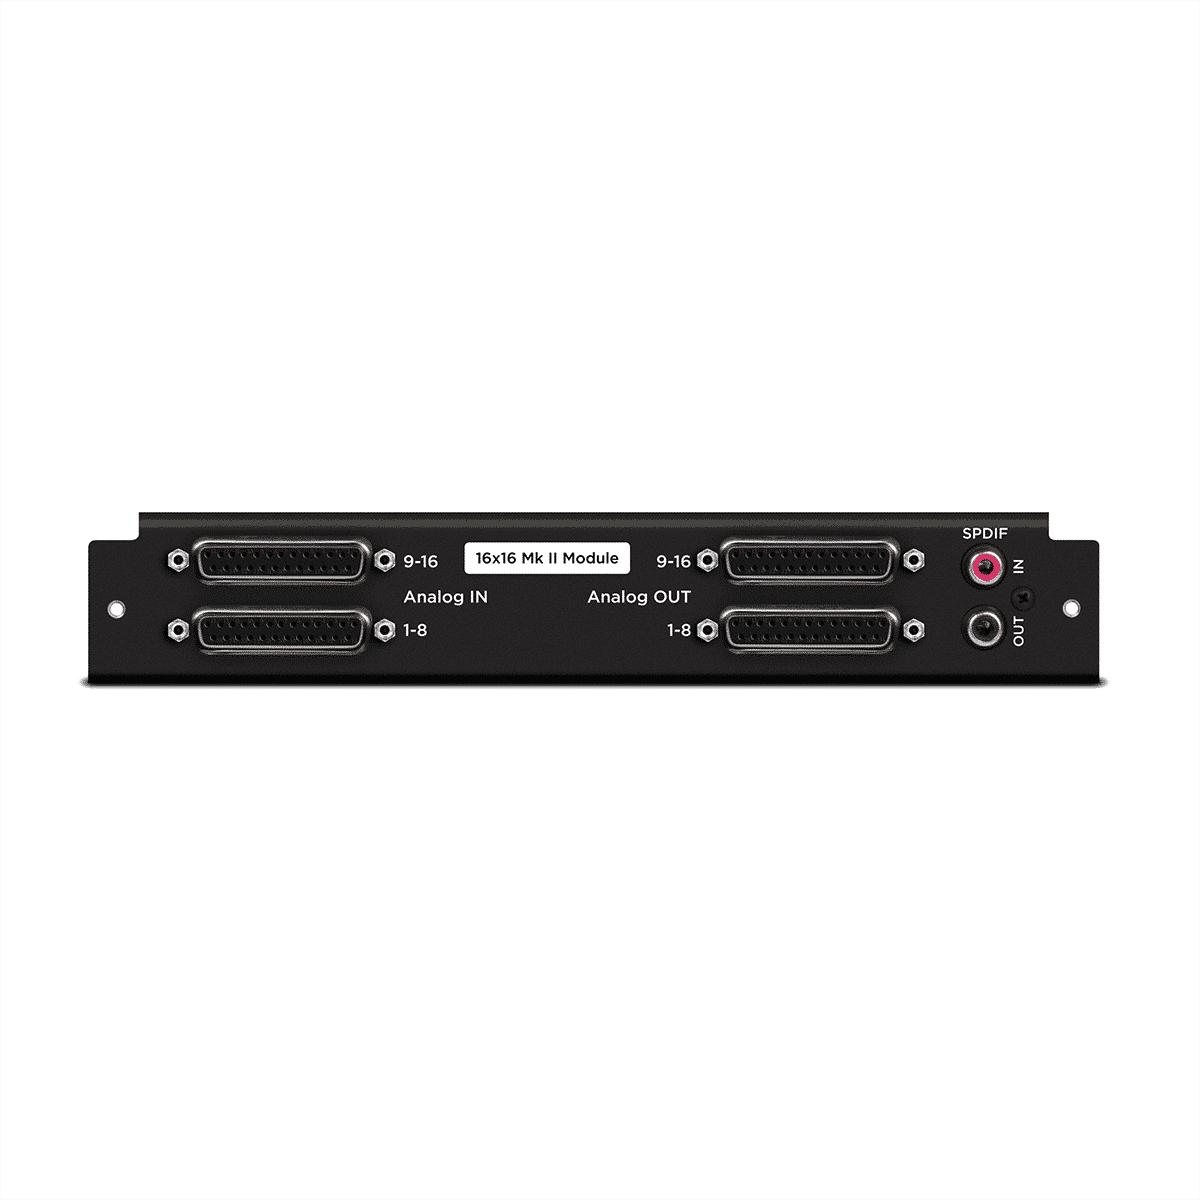 16x16 Mk2 Convertitori Audio, Schede di espansione, Pro Audio, Audio Digitale, Schede Audio per PC e MAC, Accessori